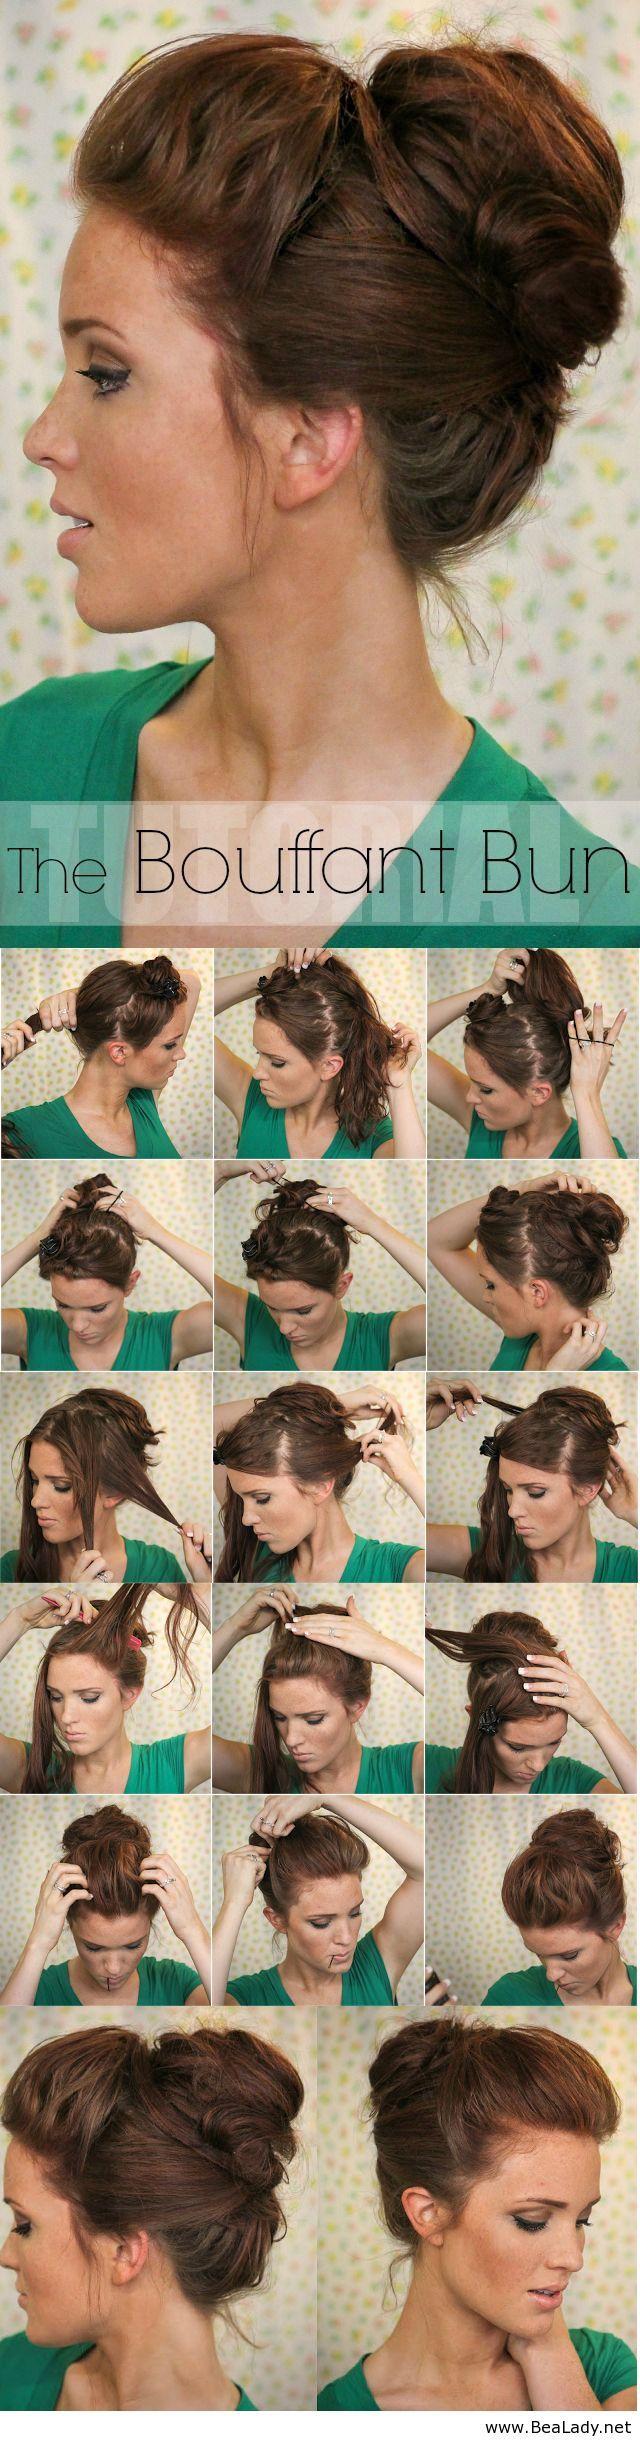 Fashionable hairstyle tutorials for long thick hair bun updo bun